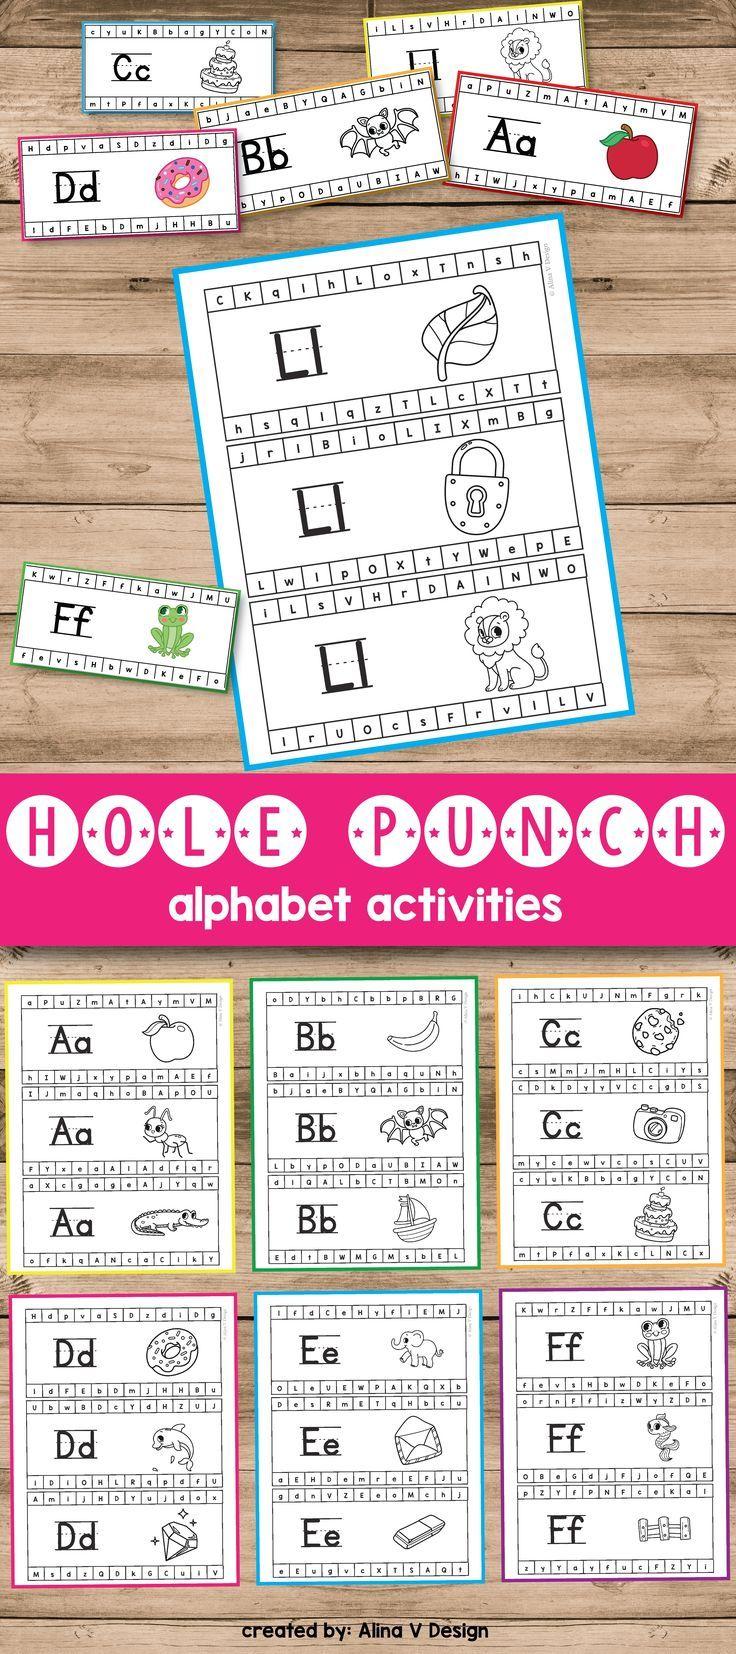 Hole Punch Activities (Alphabet Hole Punch Cards) | Pinterest ...